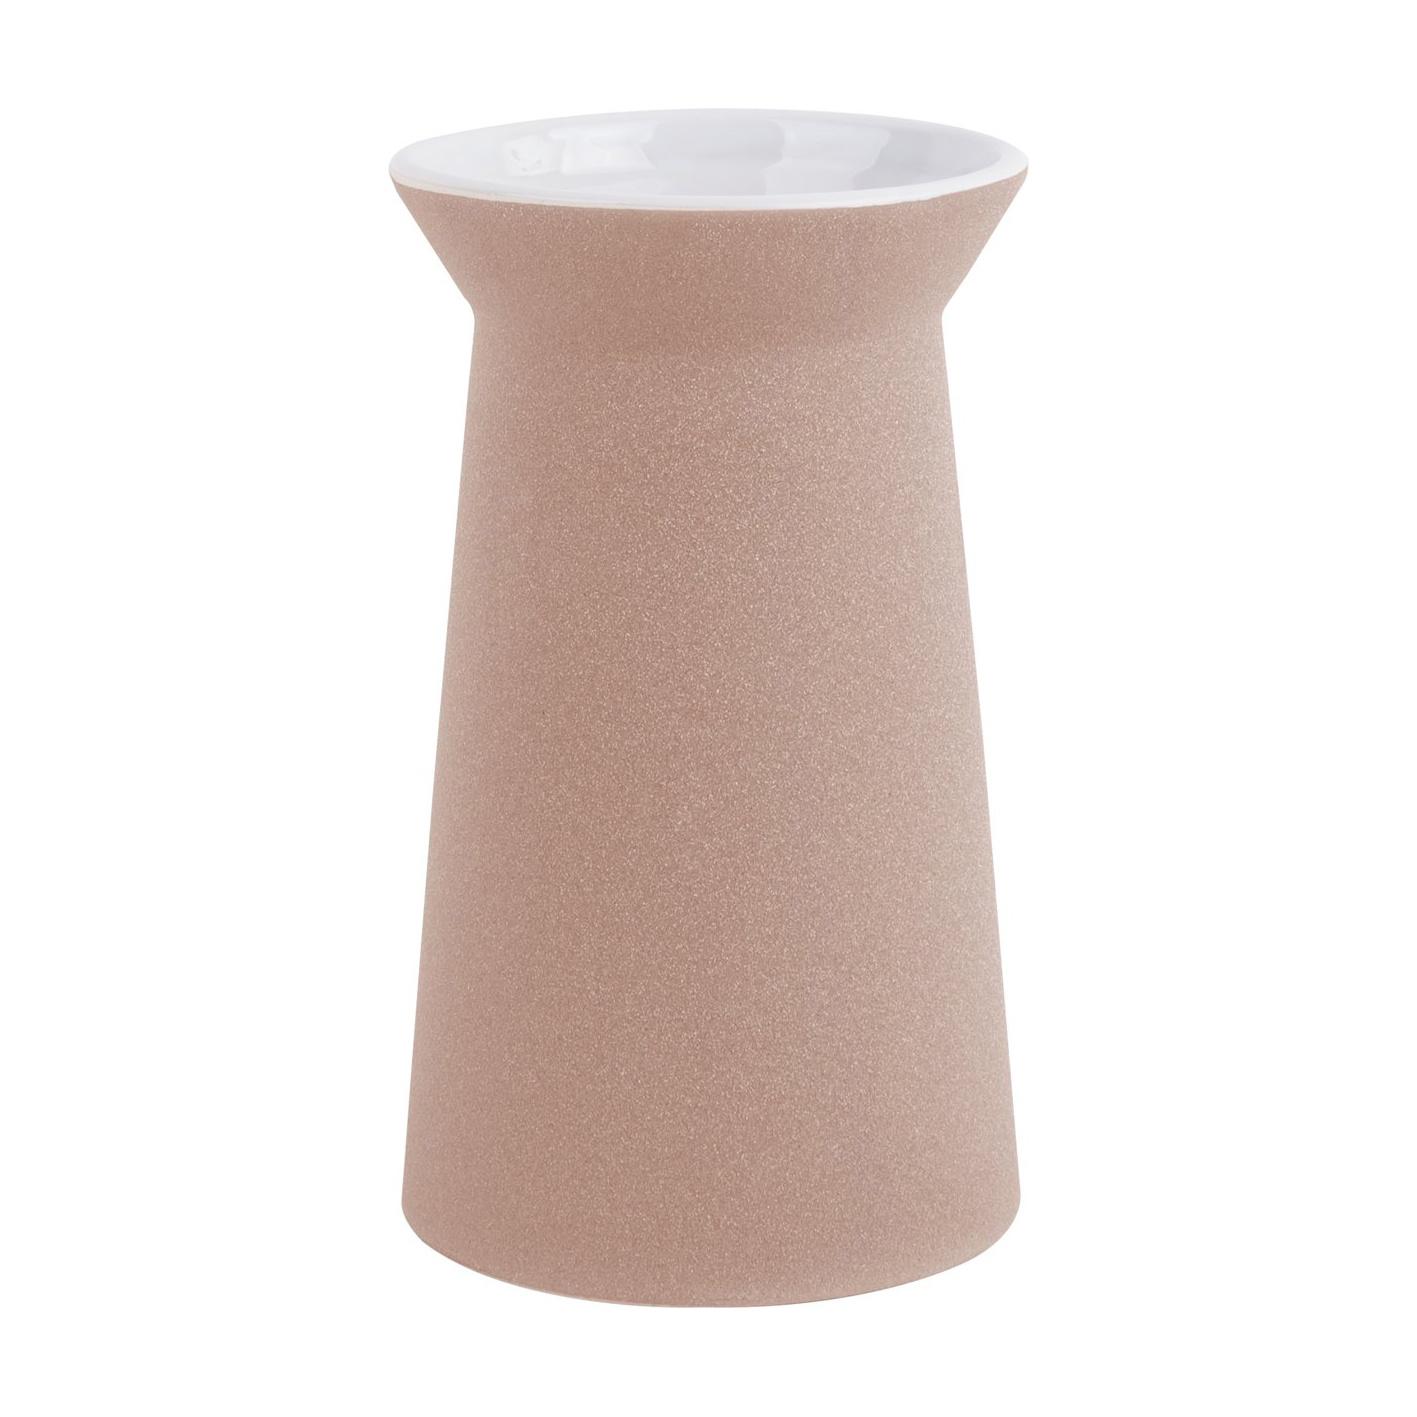 "Design vaas ""Cone"" van mat roze keramiek"